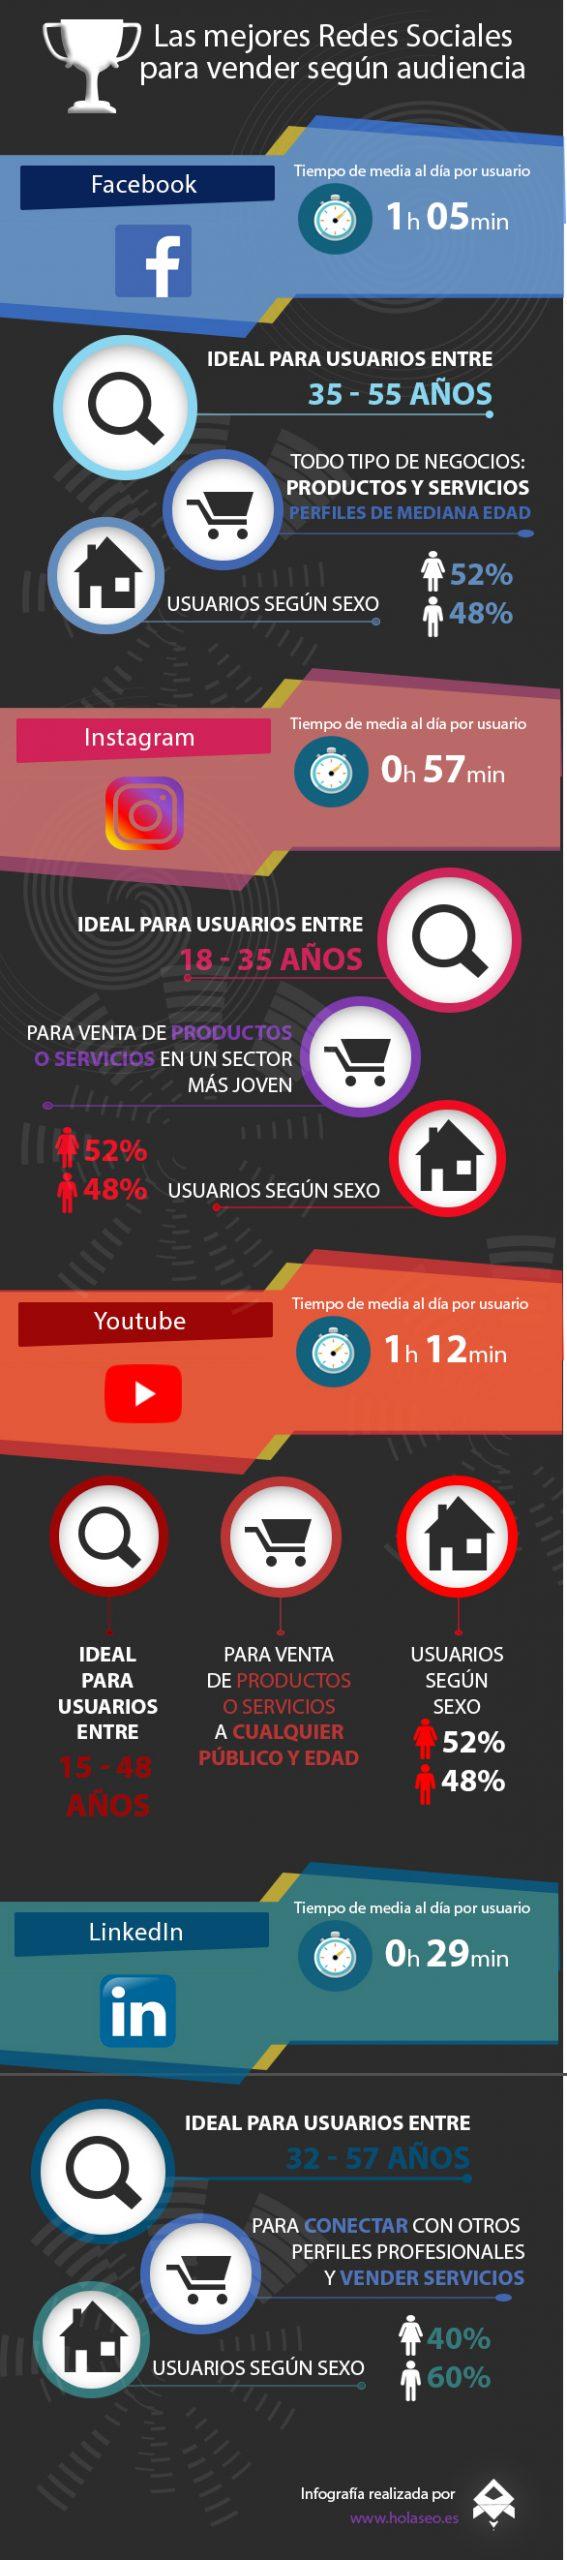 Infografia venta en Redes Sociales